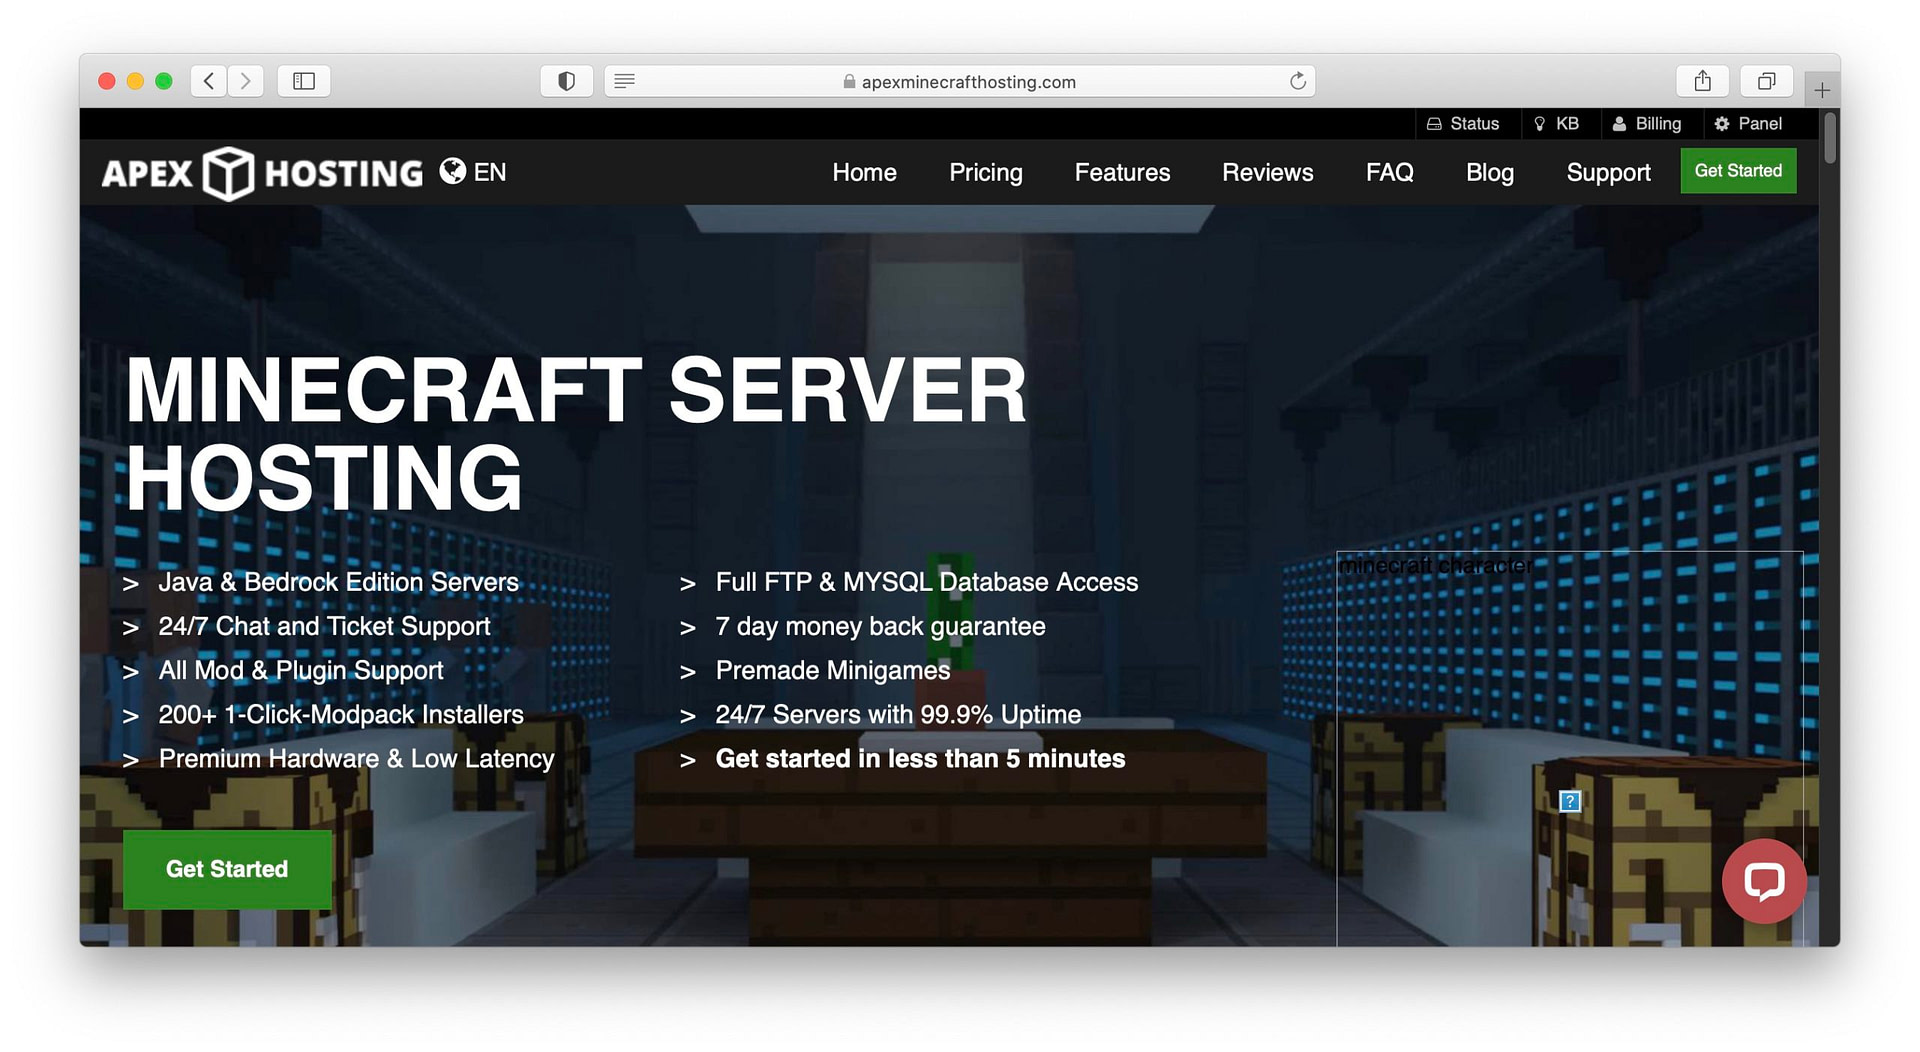 Apex Hosting Minecraft options.